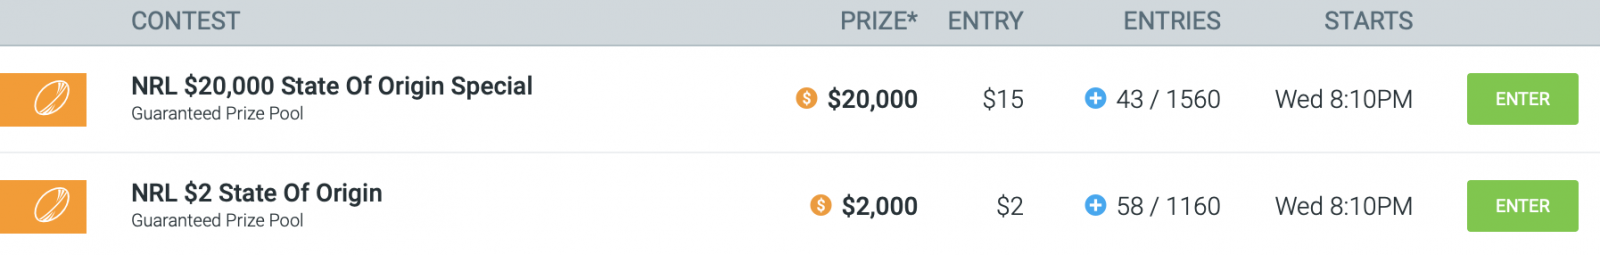 Moneyball contests